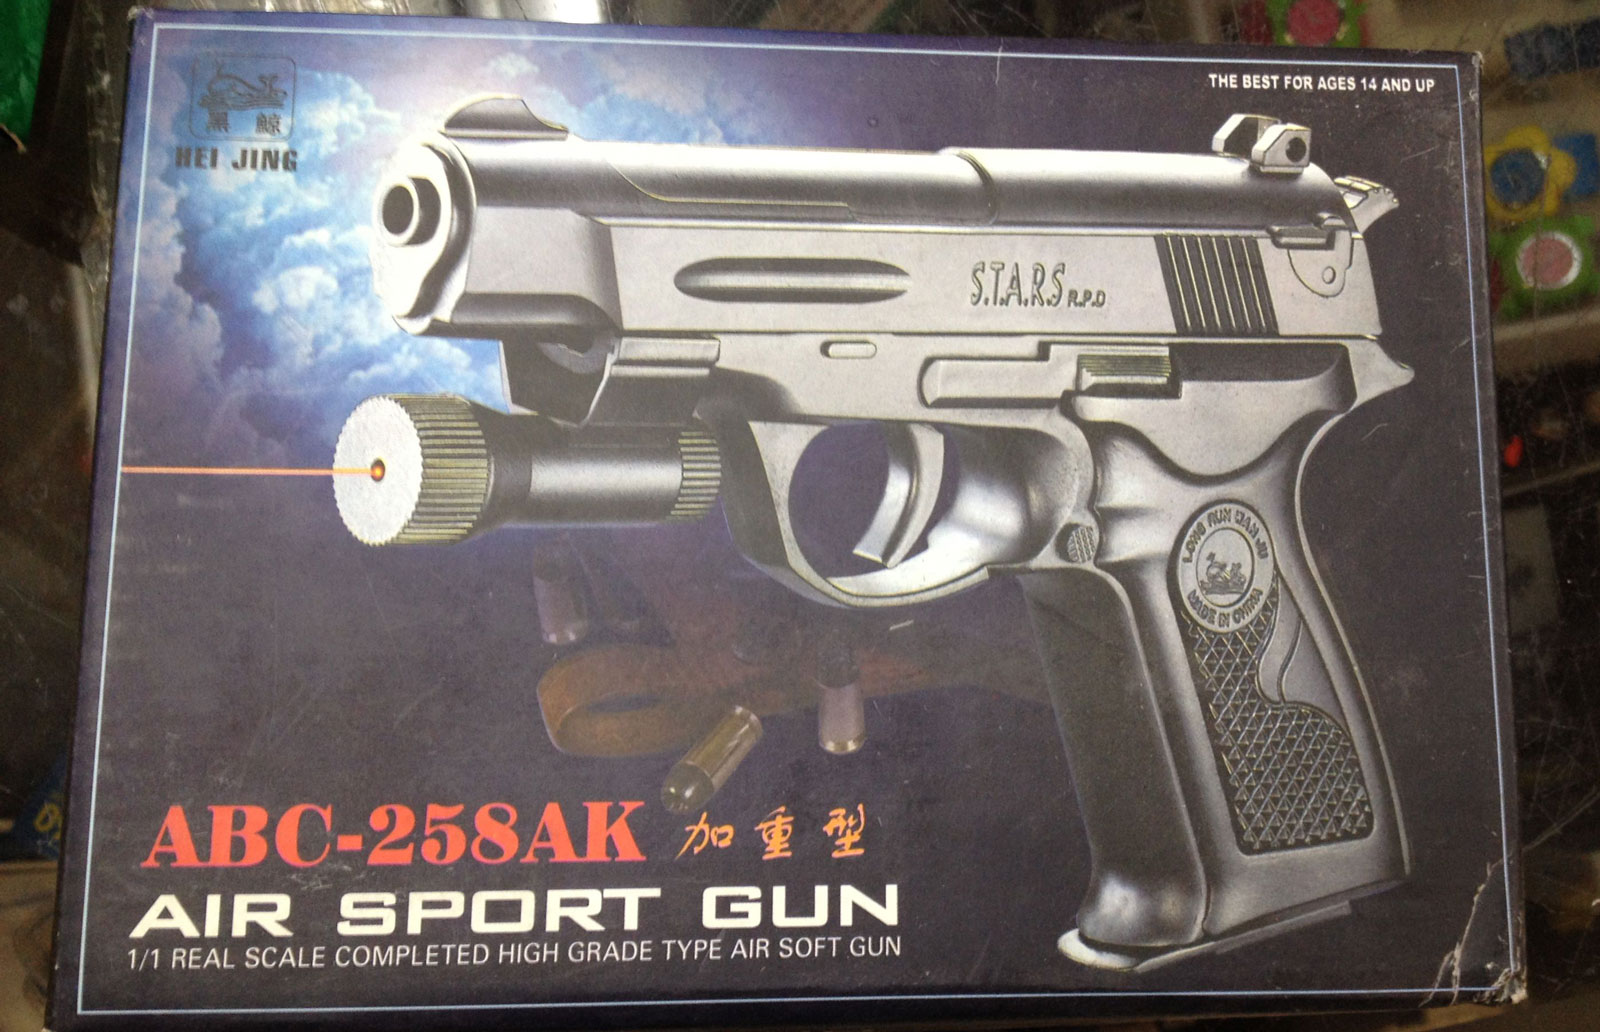 Realistic BB gun